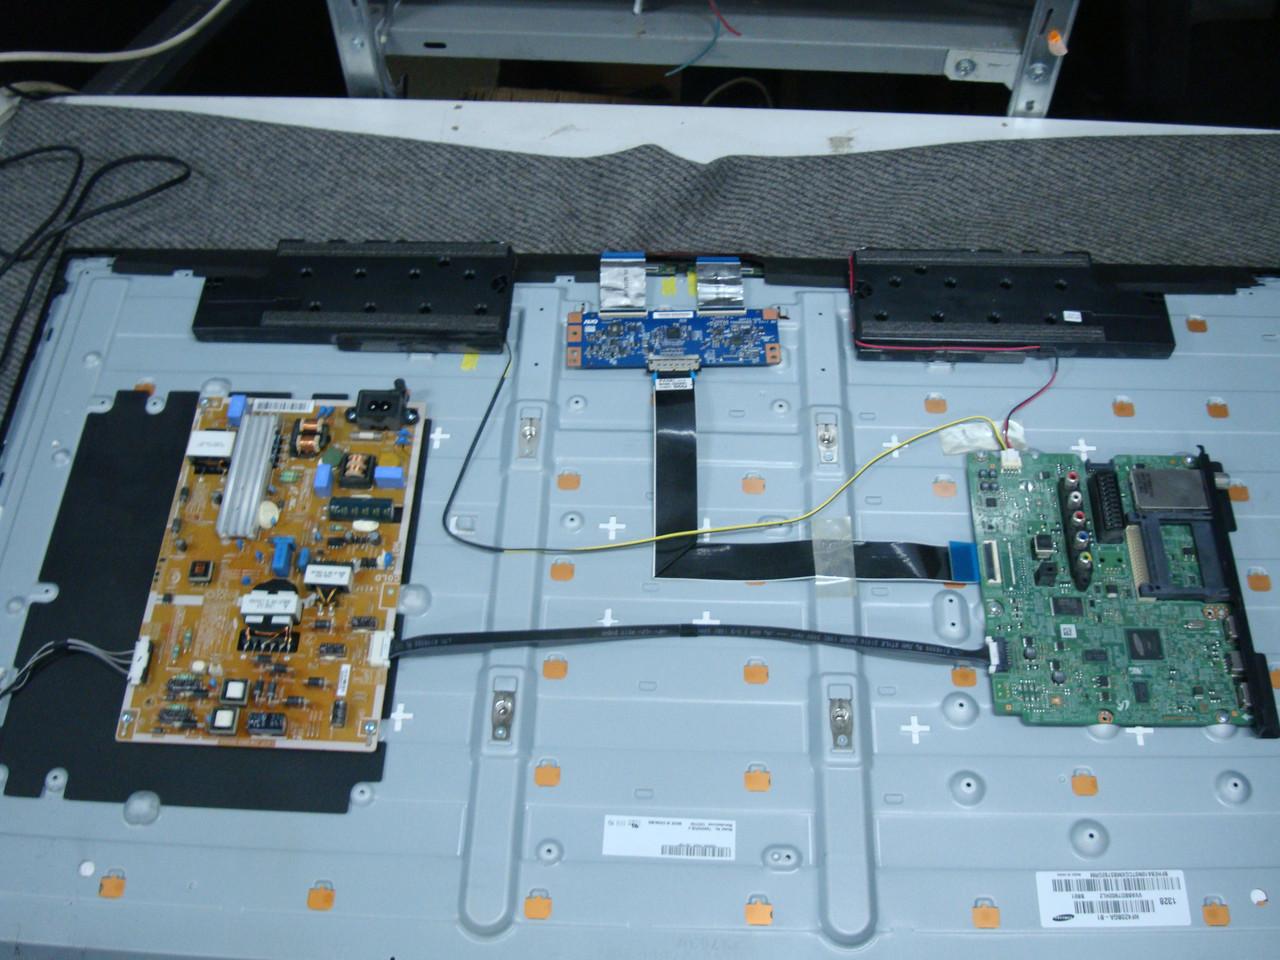 Запчасти к телевизору Samsung UE42F5020AK (BN44-00609A, T500HVN05.0)